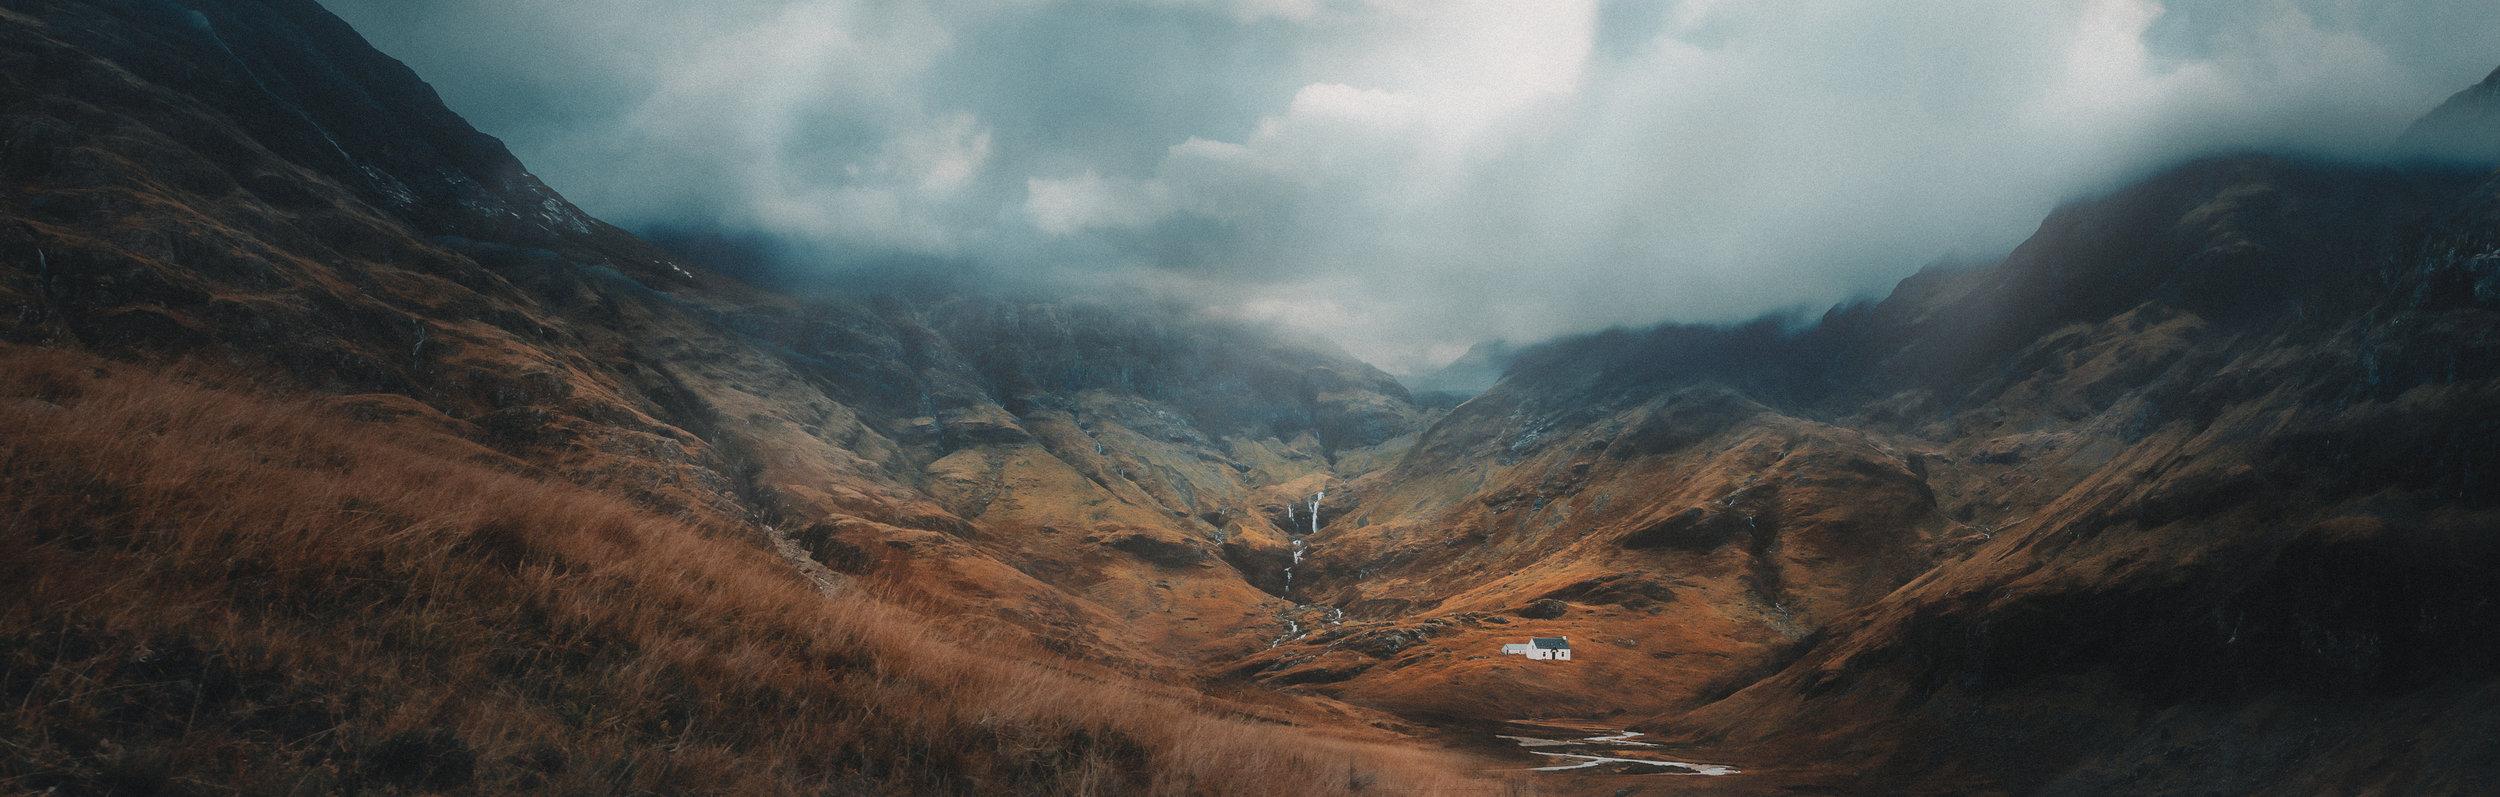 scotland_landscape_wide.jpg